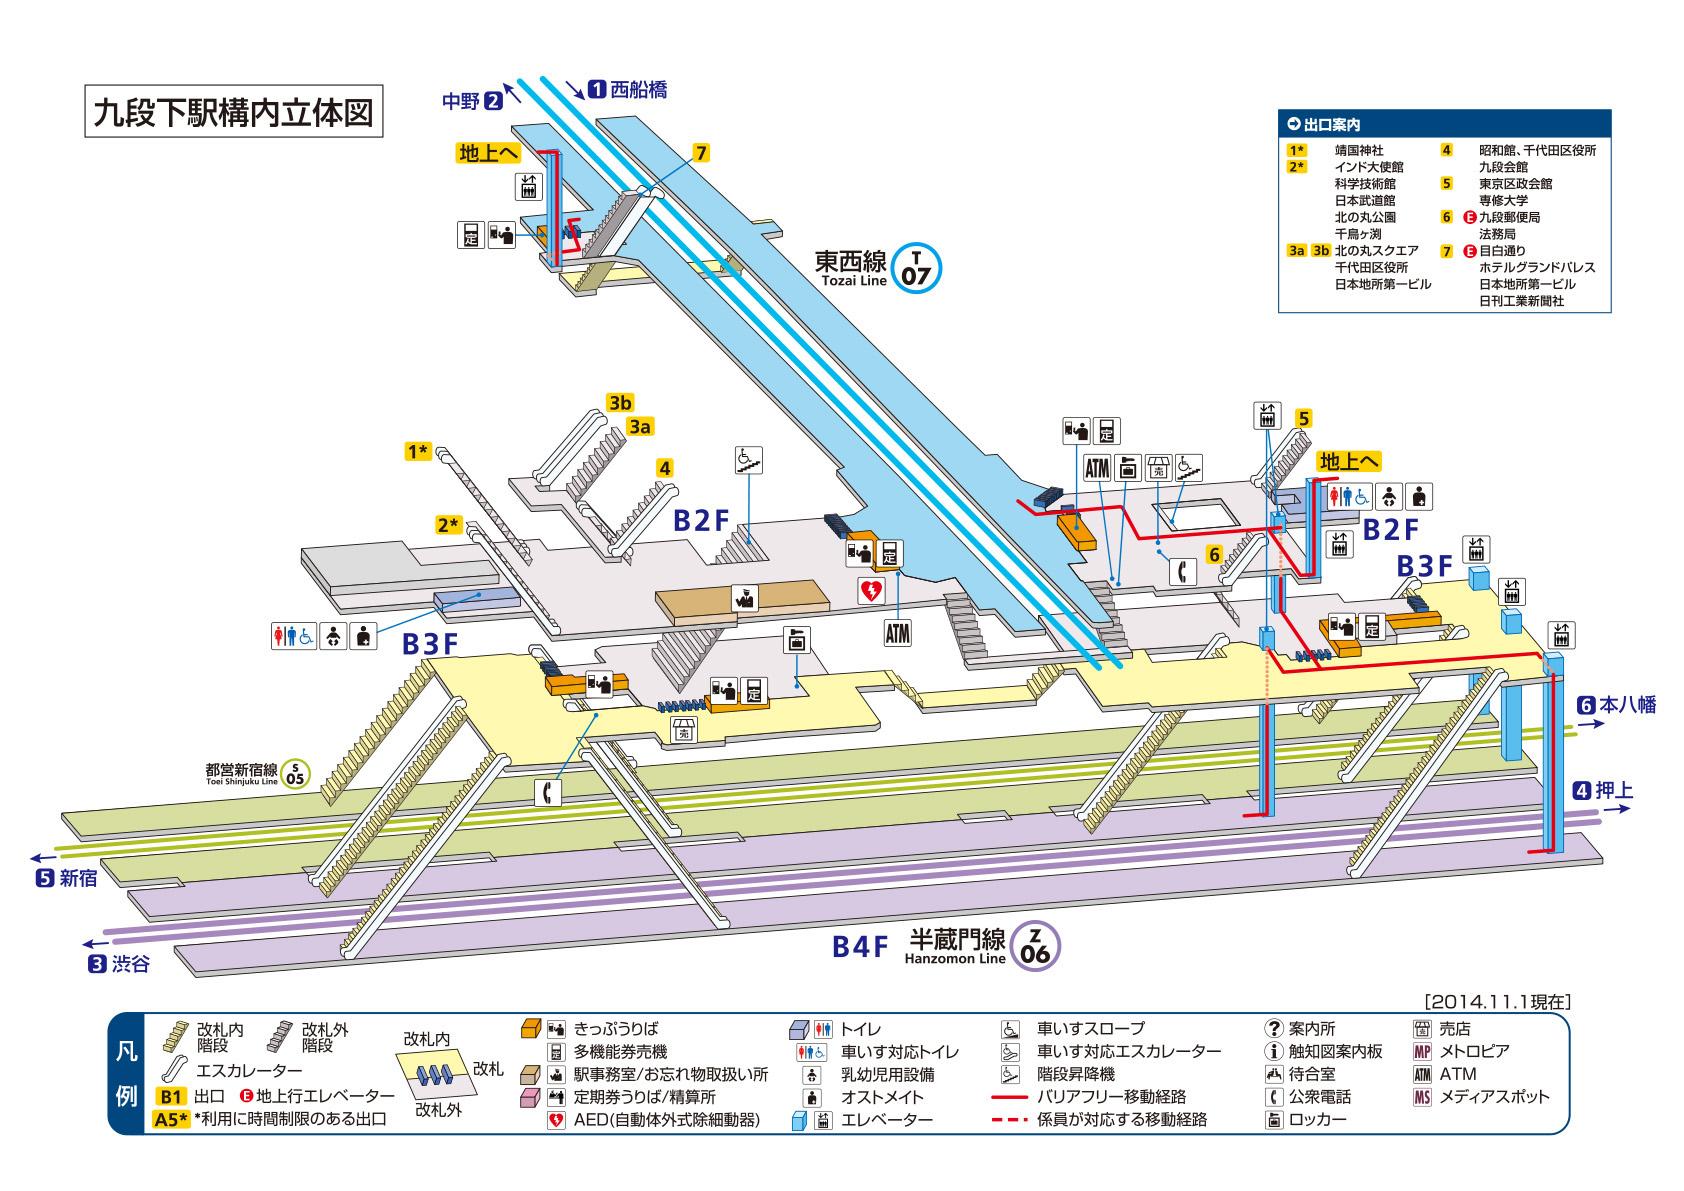 構内図 | 九段下駅/T07/Z06 | 東京メトロ